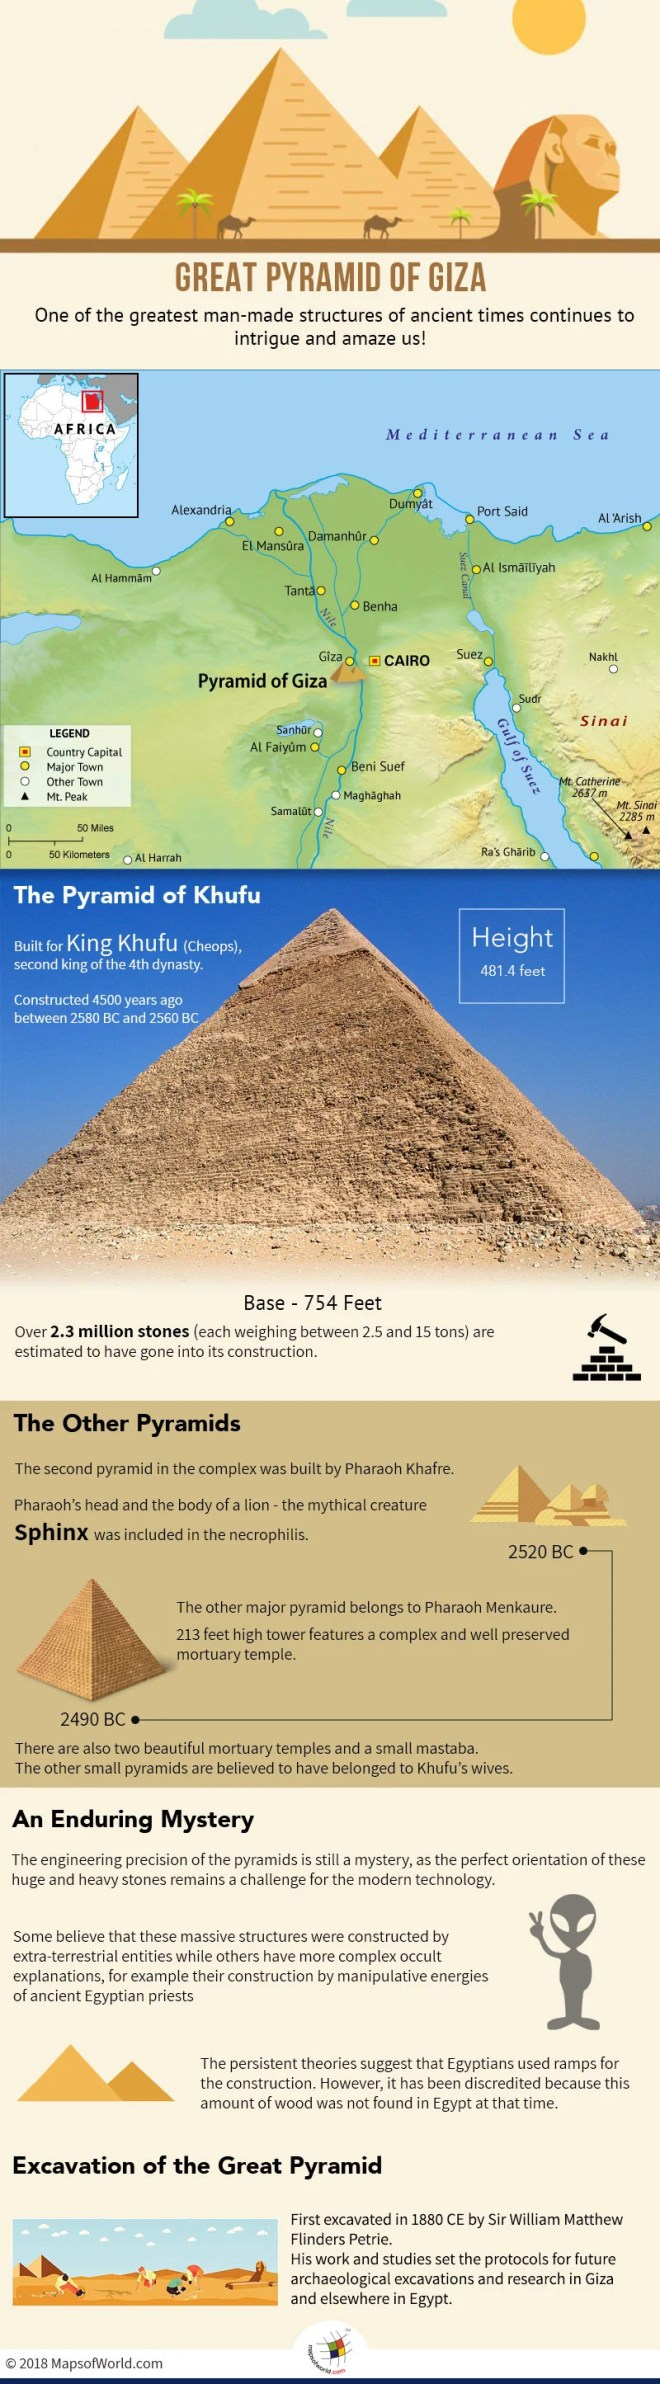 Infographic elaborating history of Great Pyramids of Giza